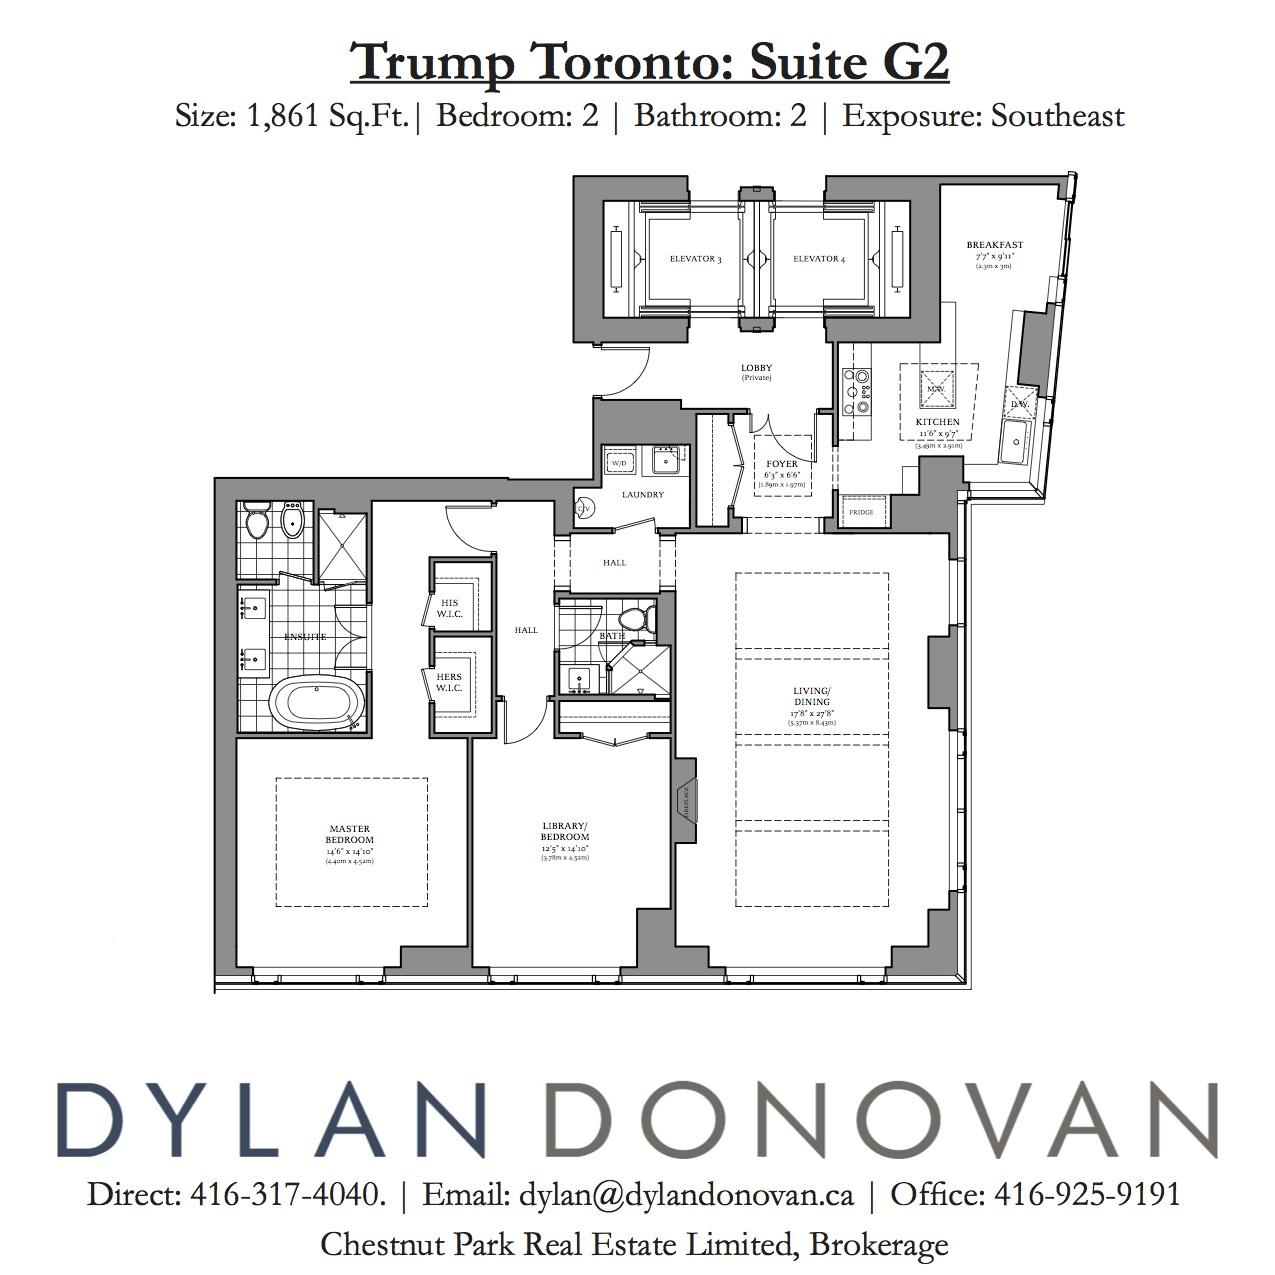 311 Bay Street Dylan Donovan